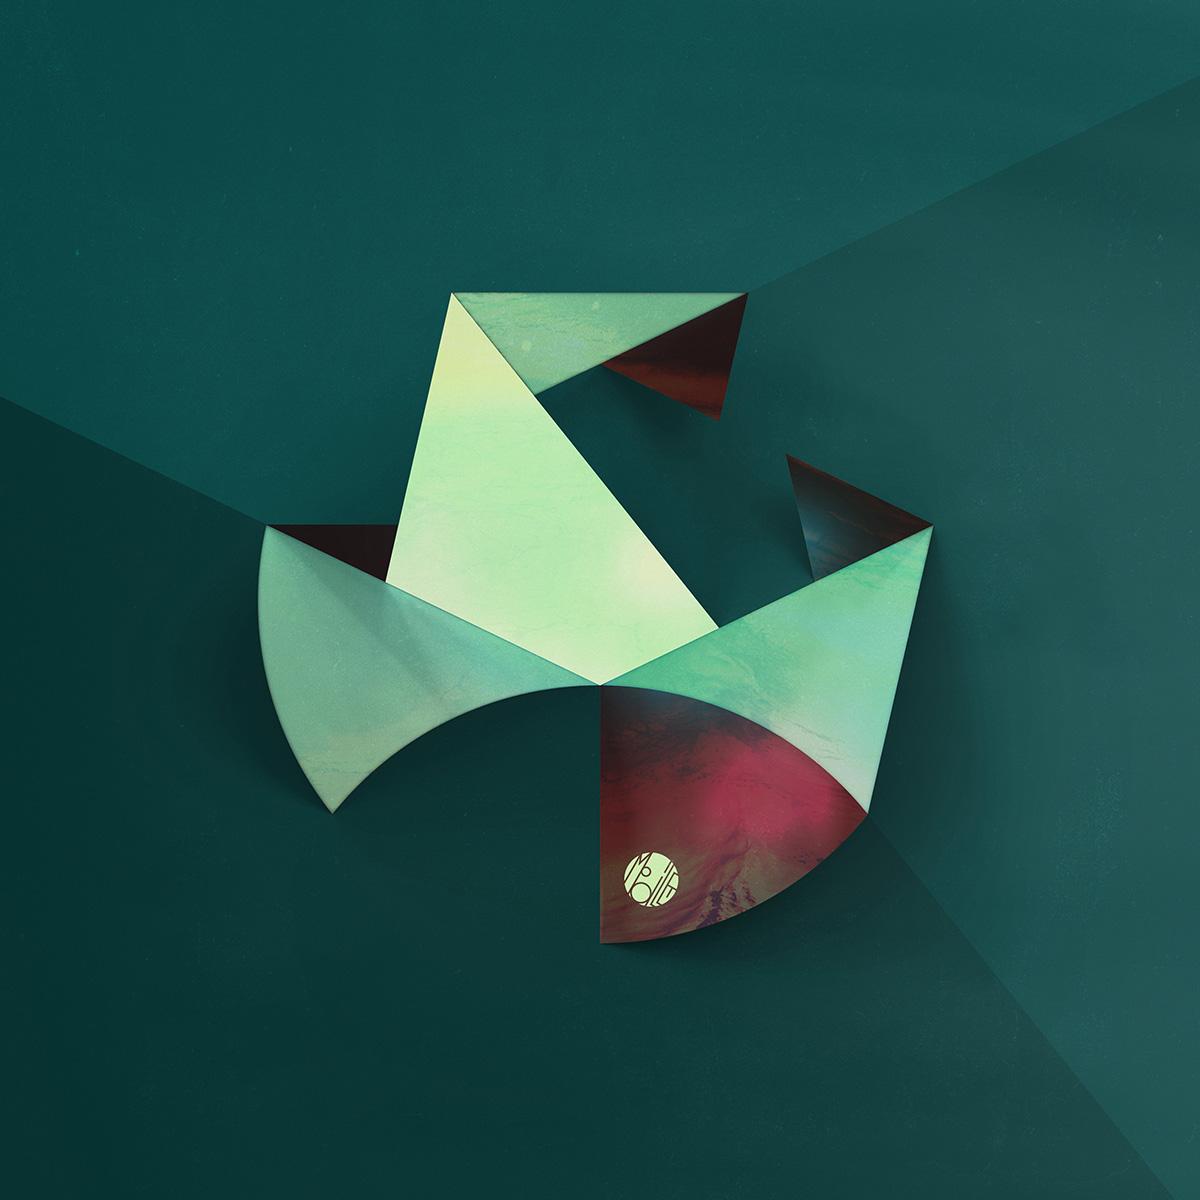 Mobilee237_RodriguezJr_Hydra_illustration_small